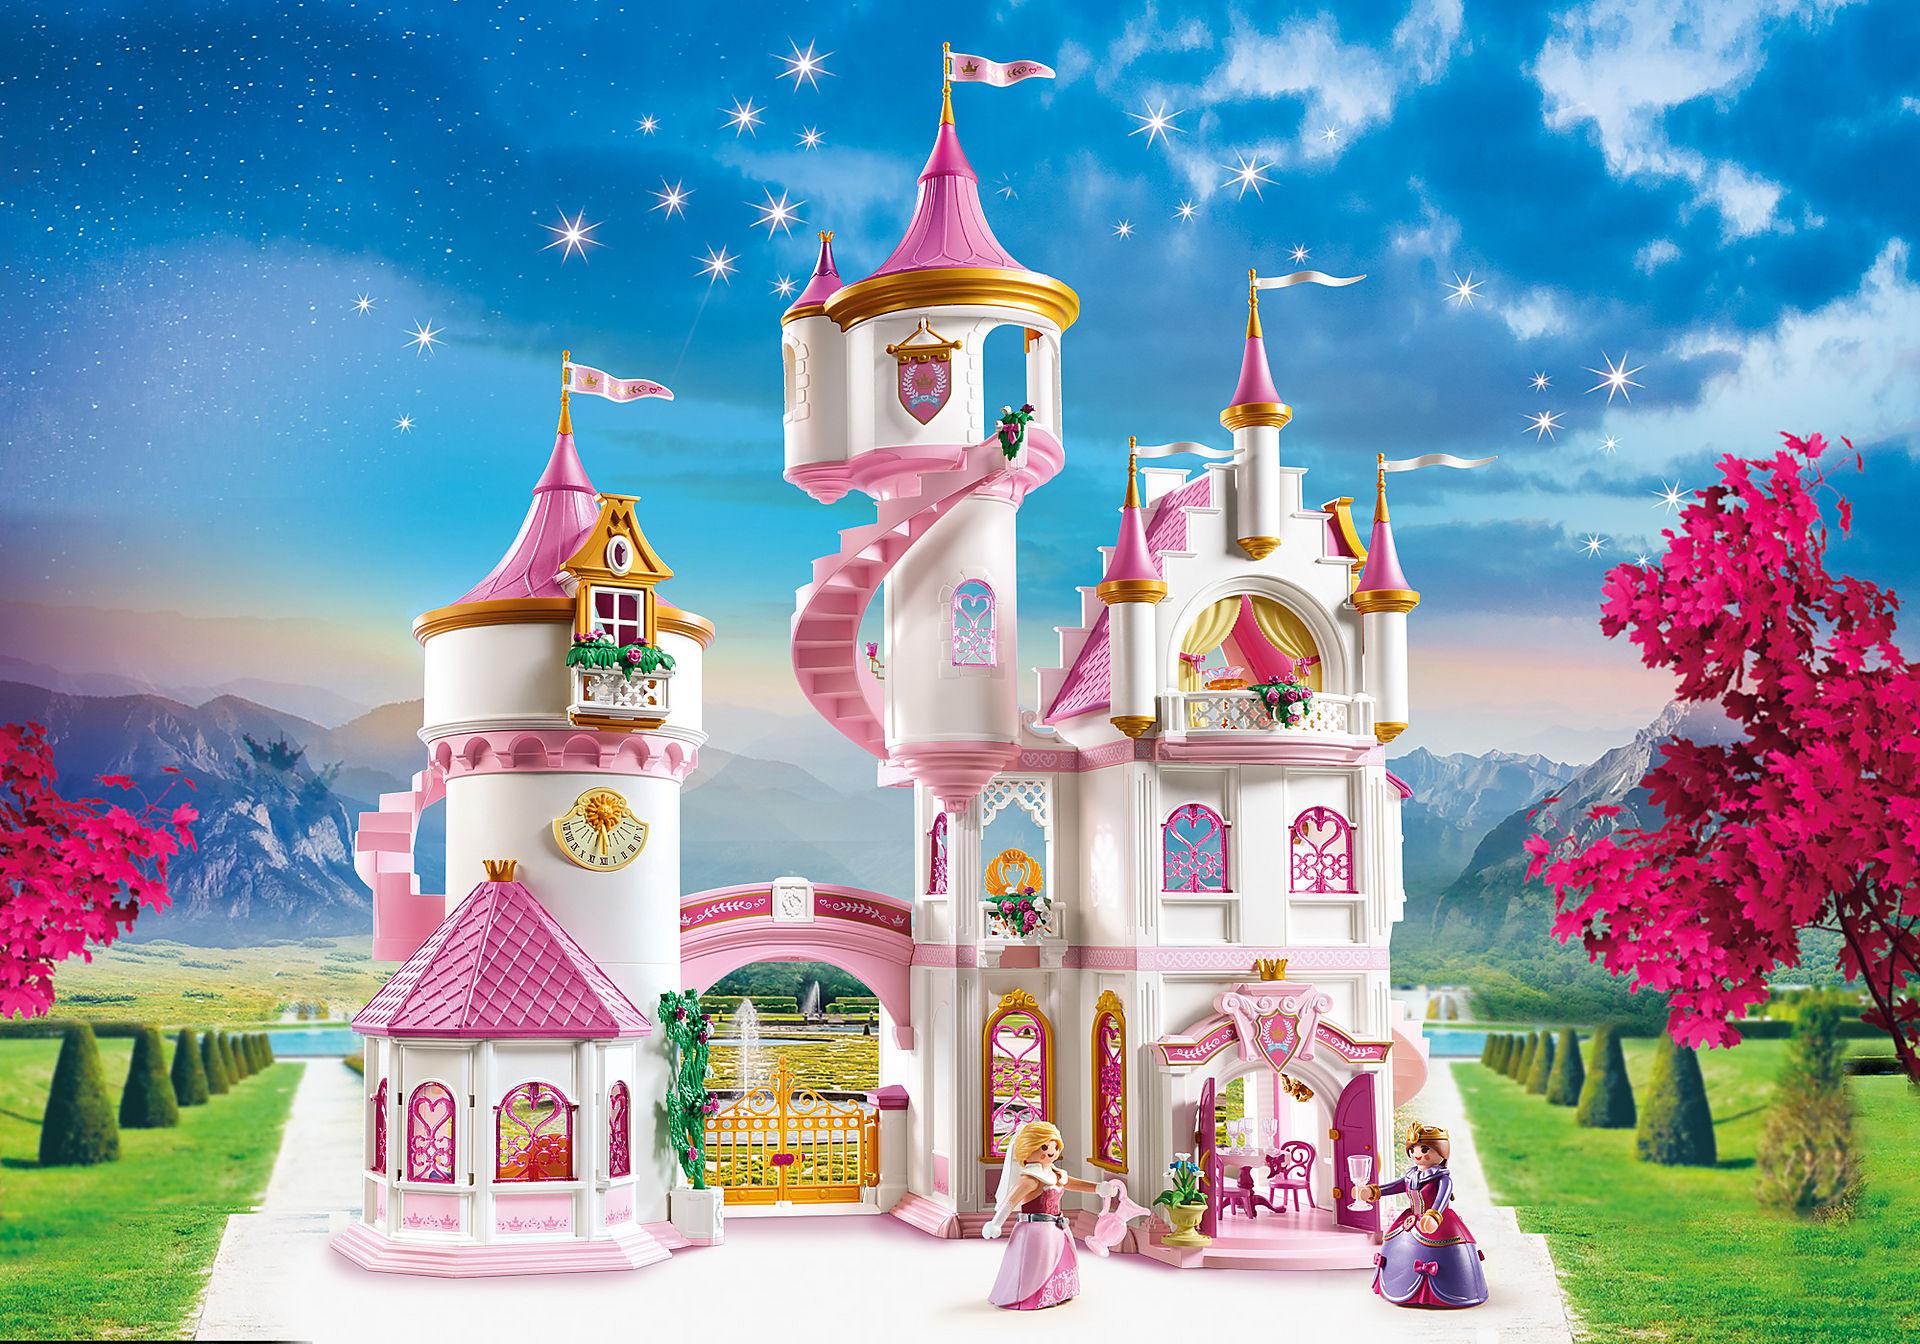 70447 Grande Castelo das Princesas zoom image1